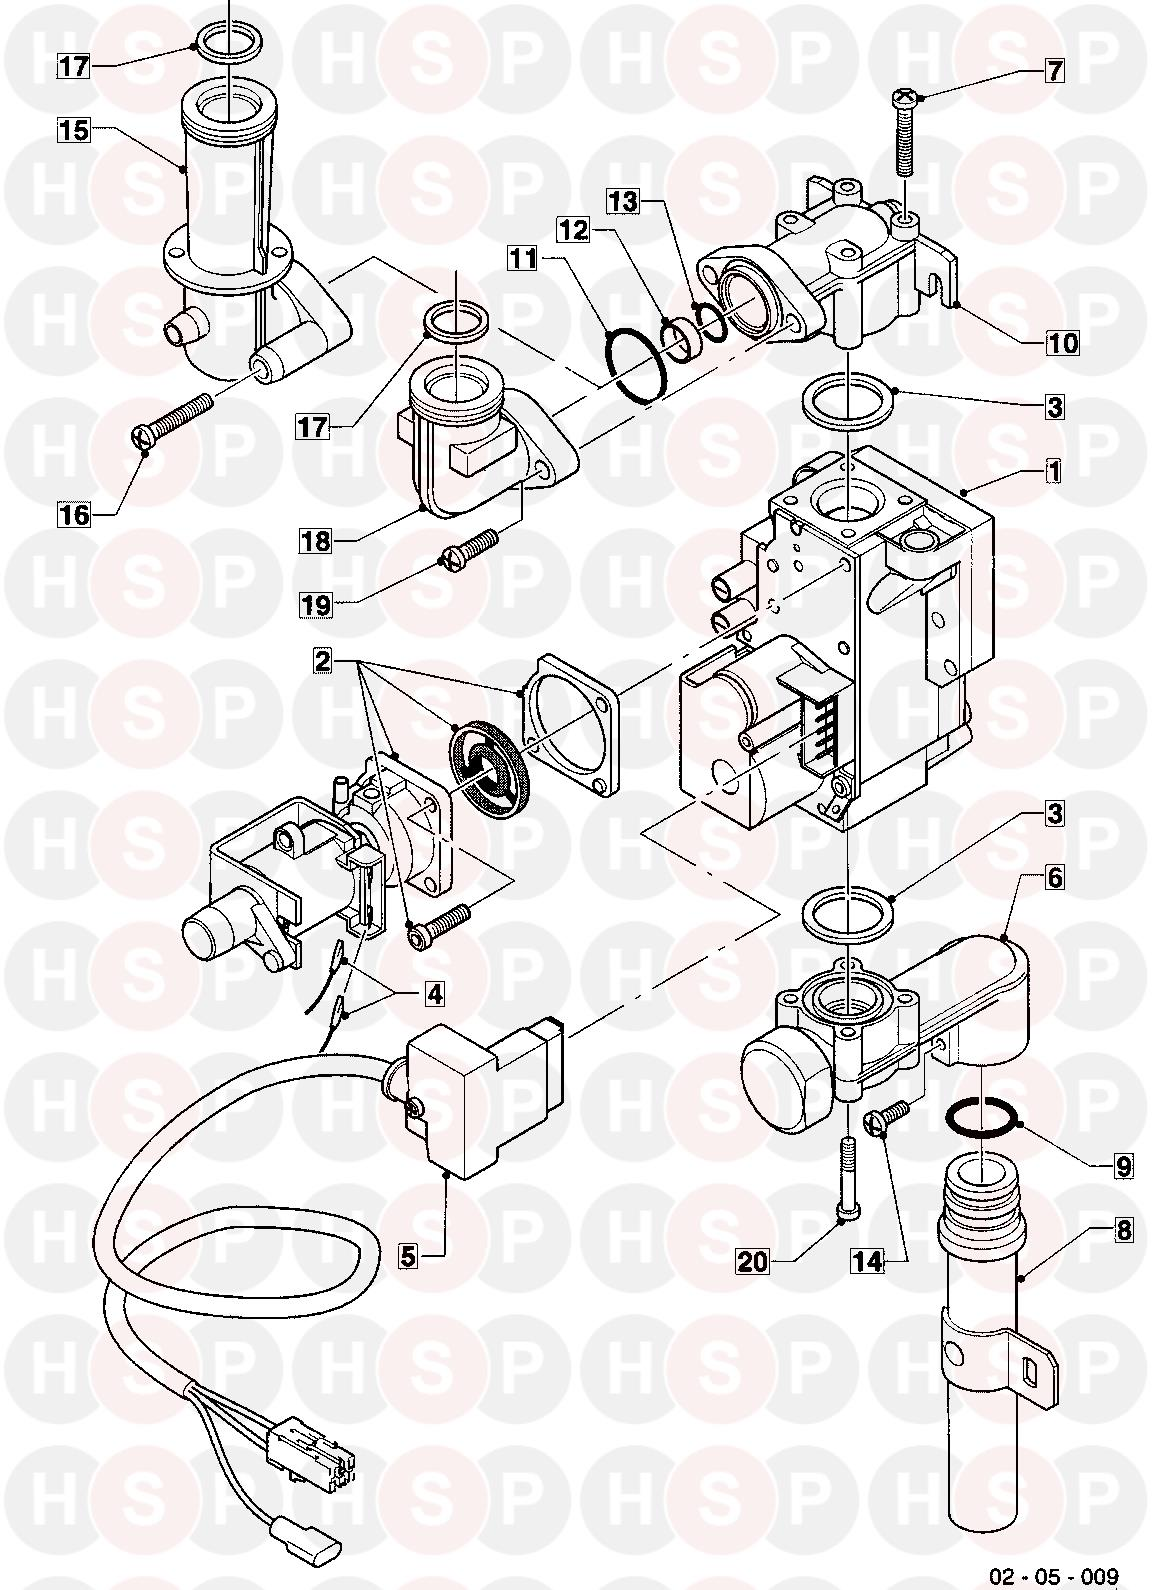 Vaillant turbomax vuw gb 242/1e program timer | diynot forums.